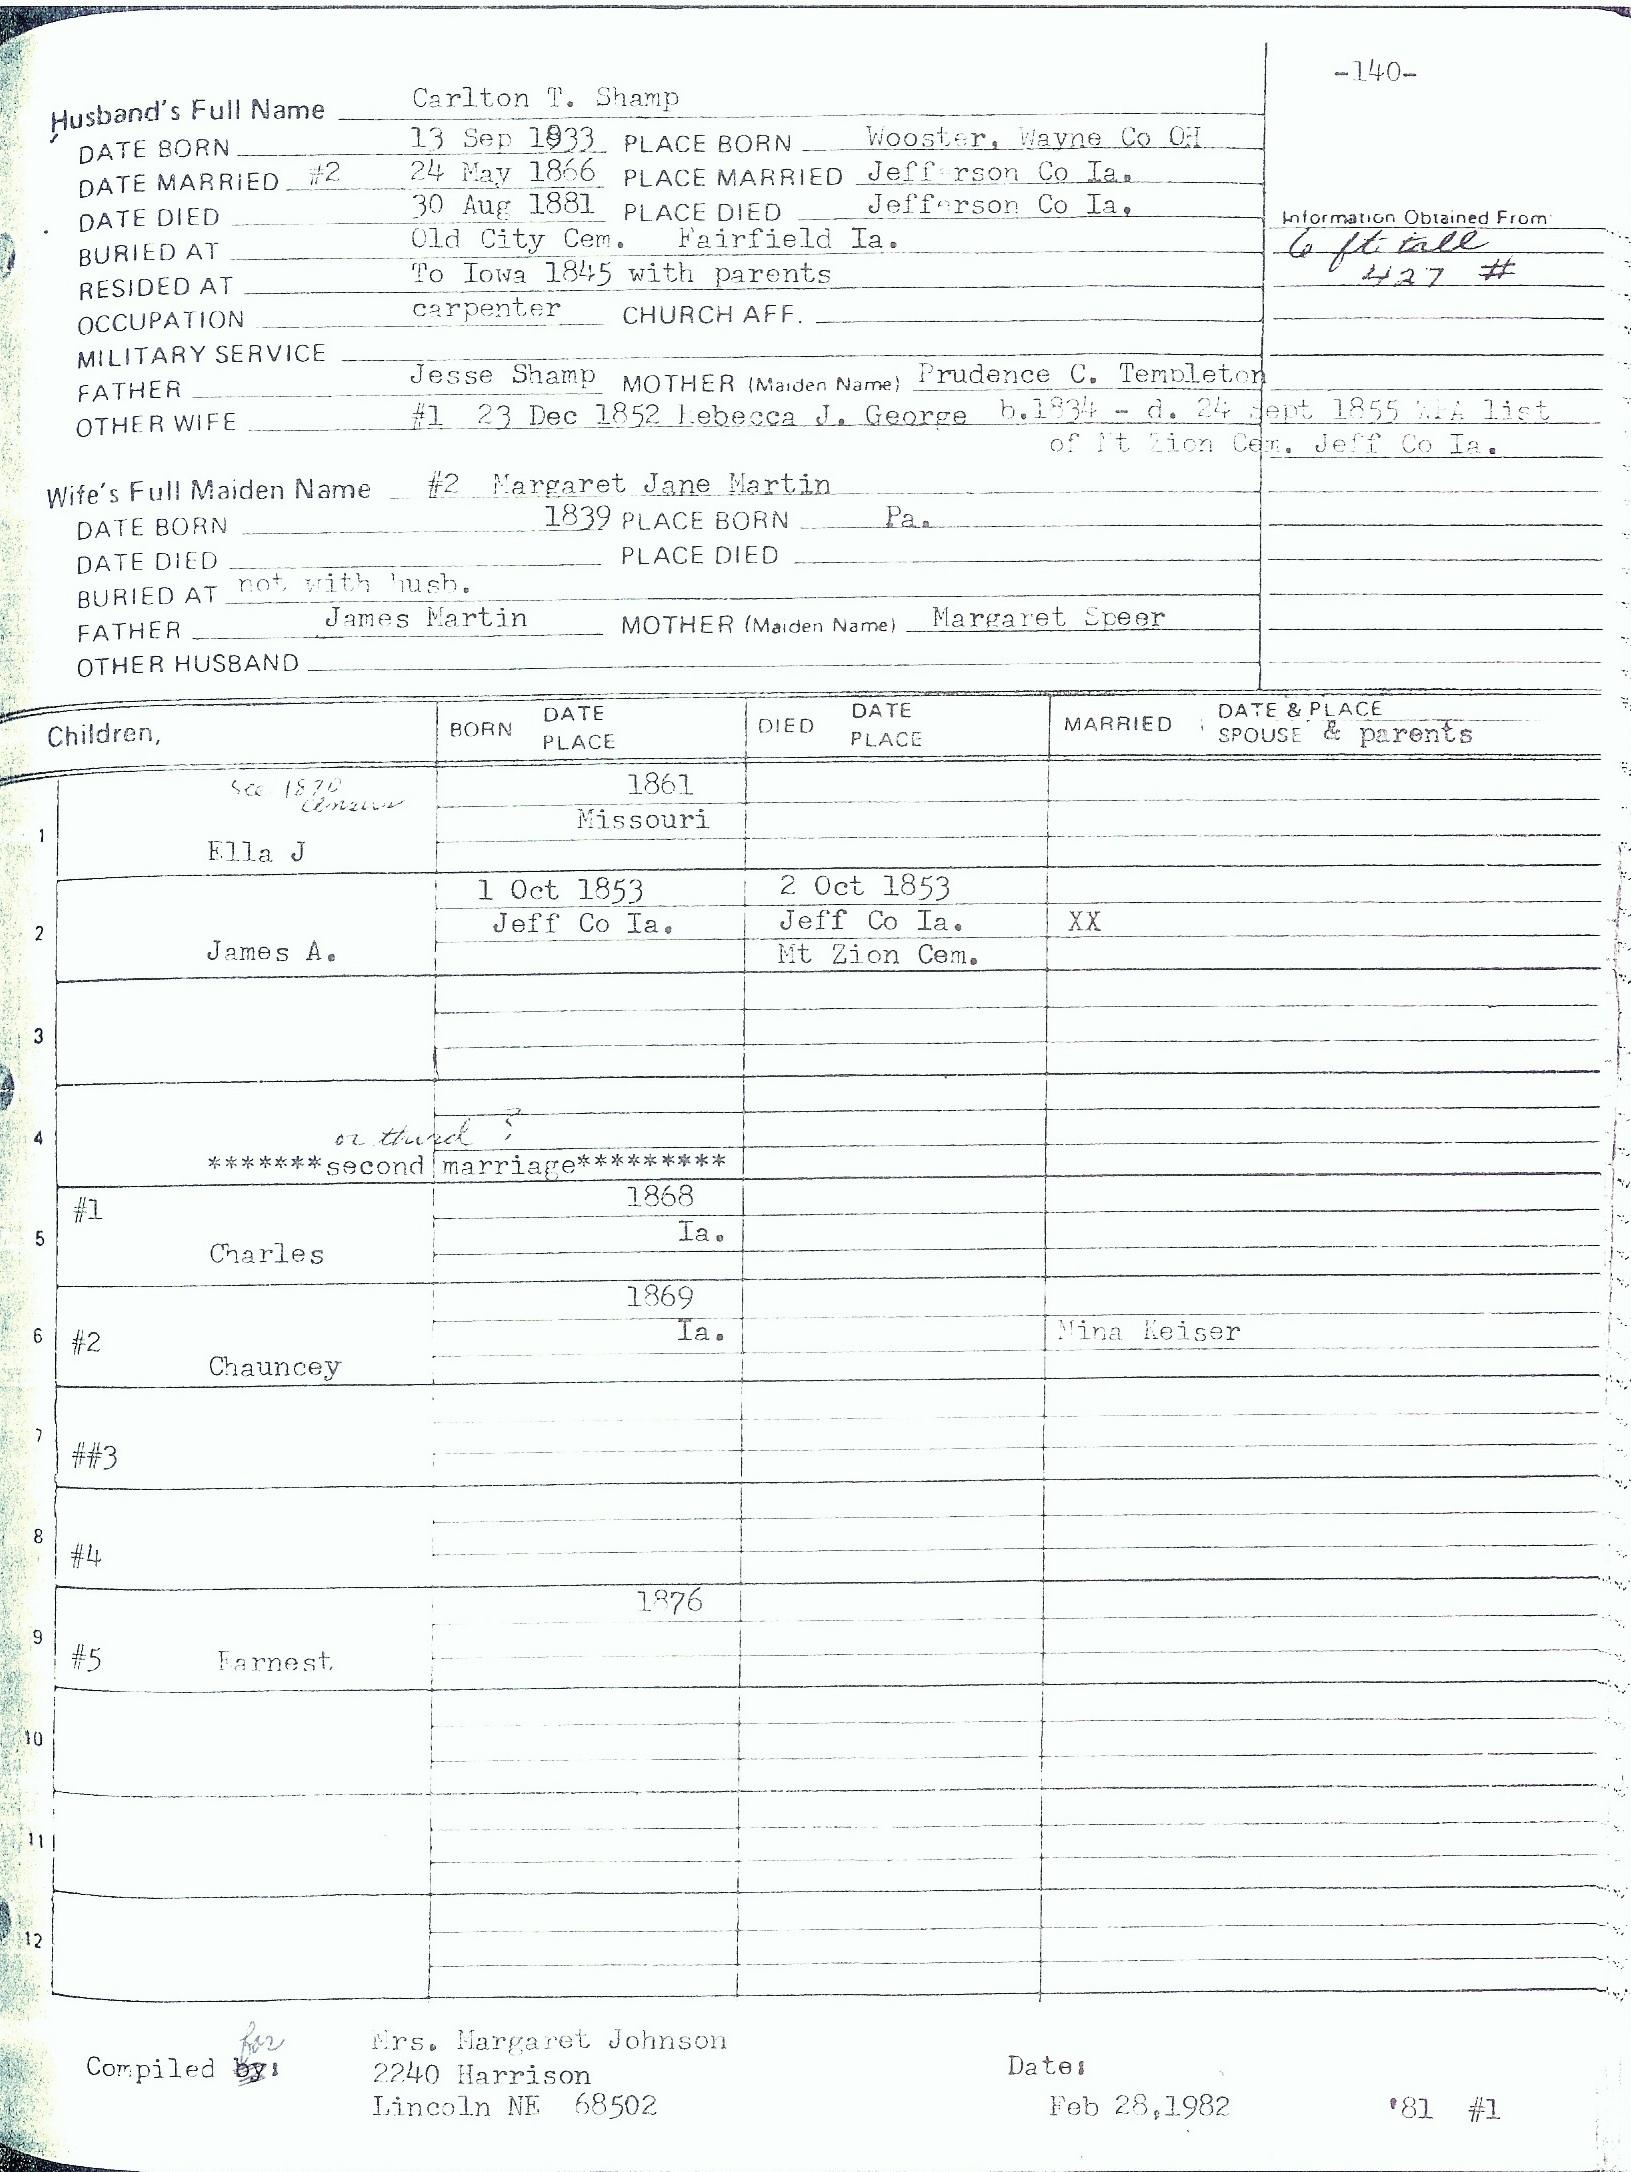 Worksheets Genealogy Worksheet genealogy worksheet